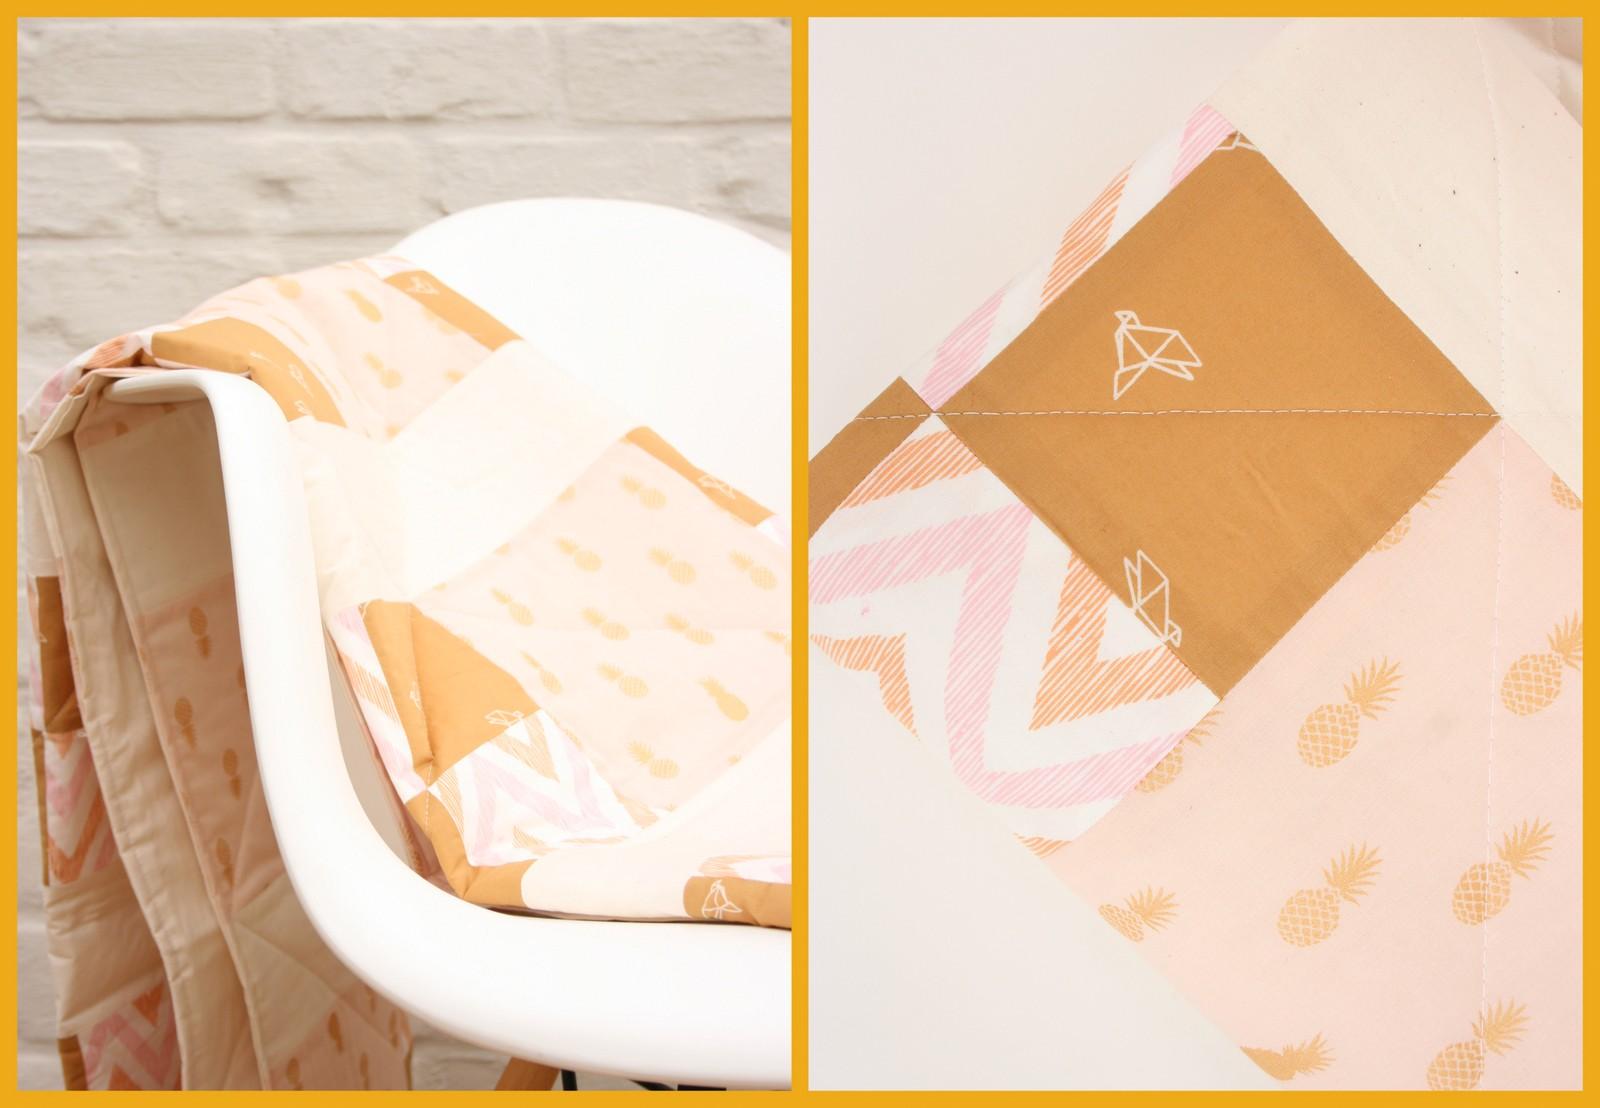 quilt (collage)